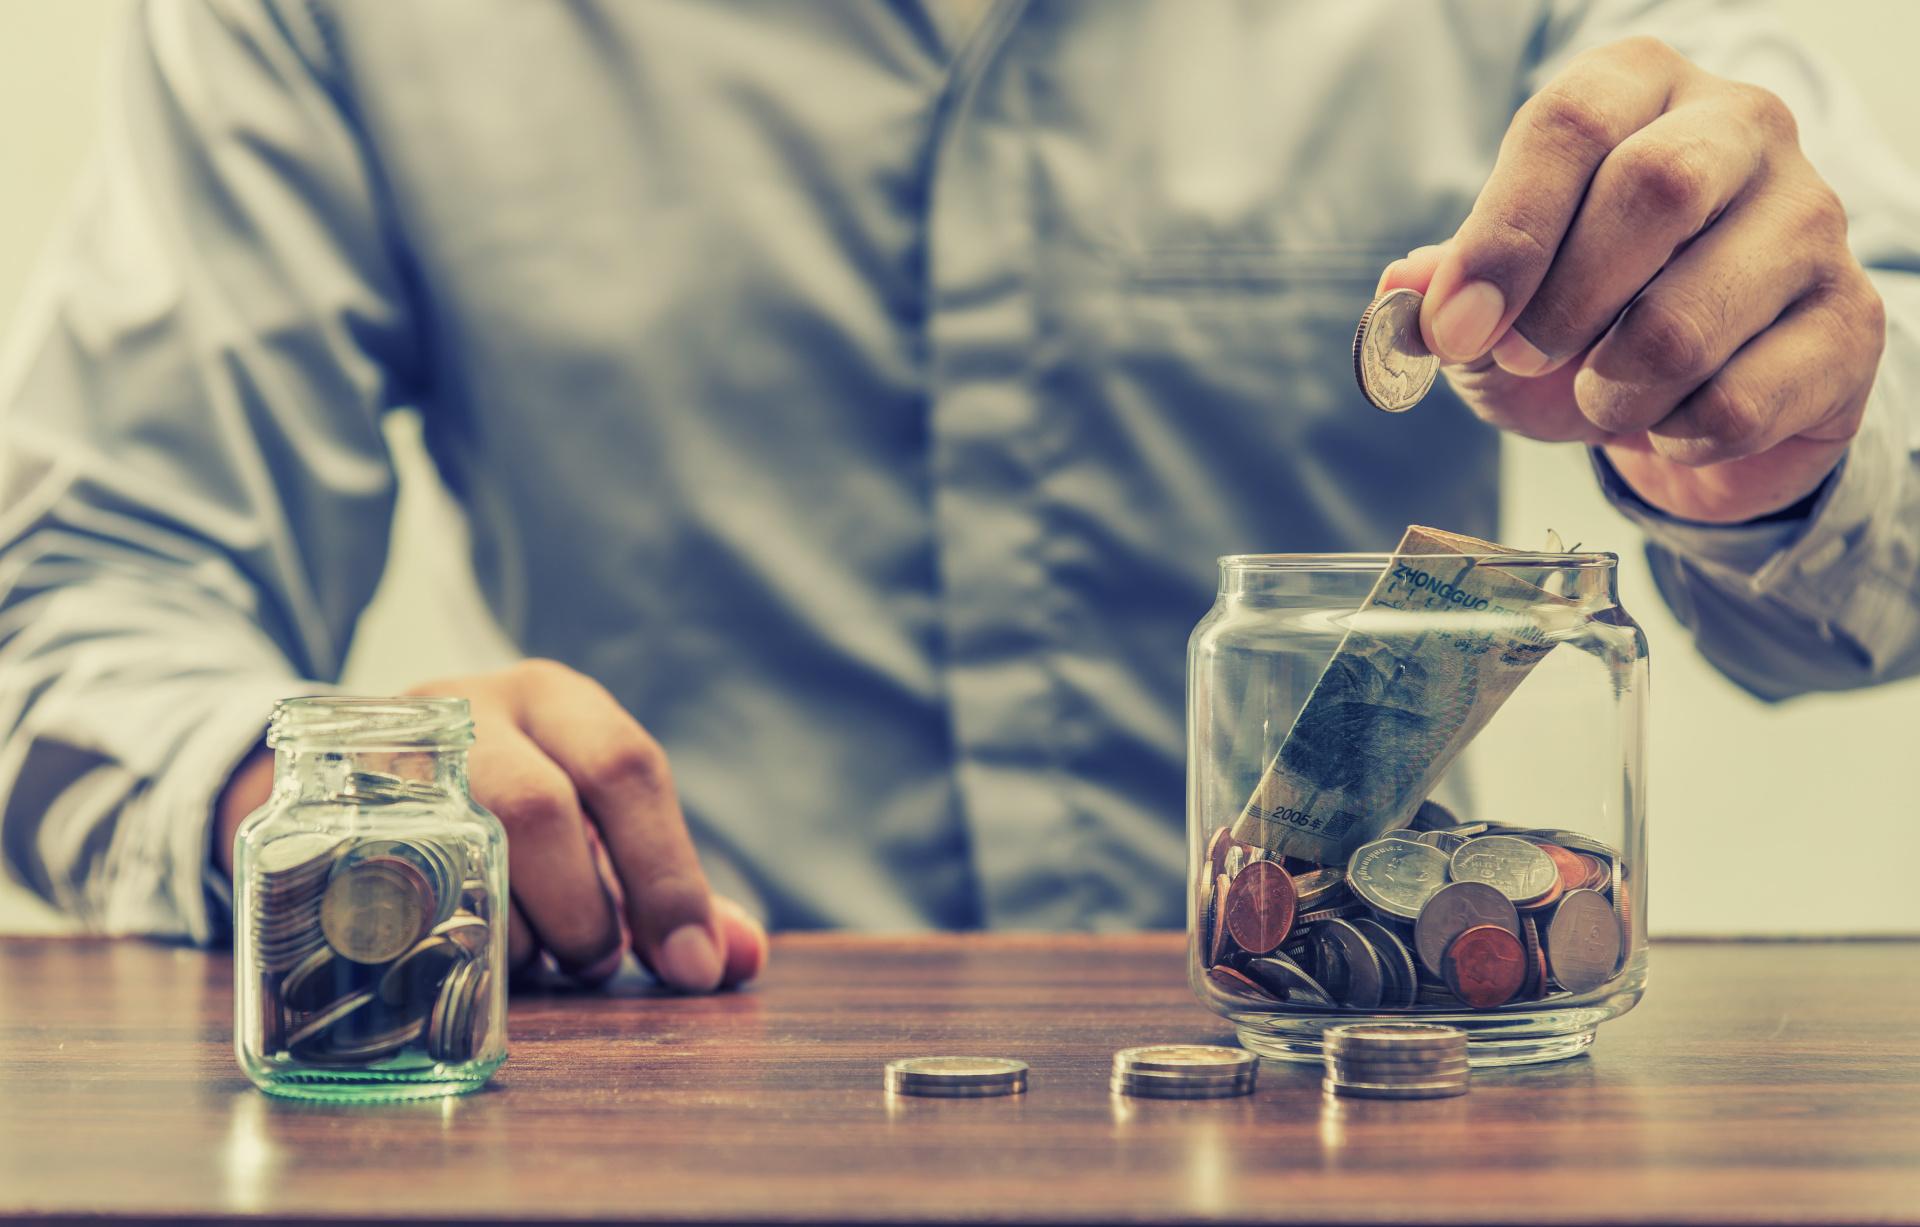 22 Ways Senior Citizens Are Saving More Money in 2018